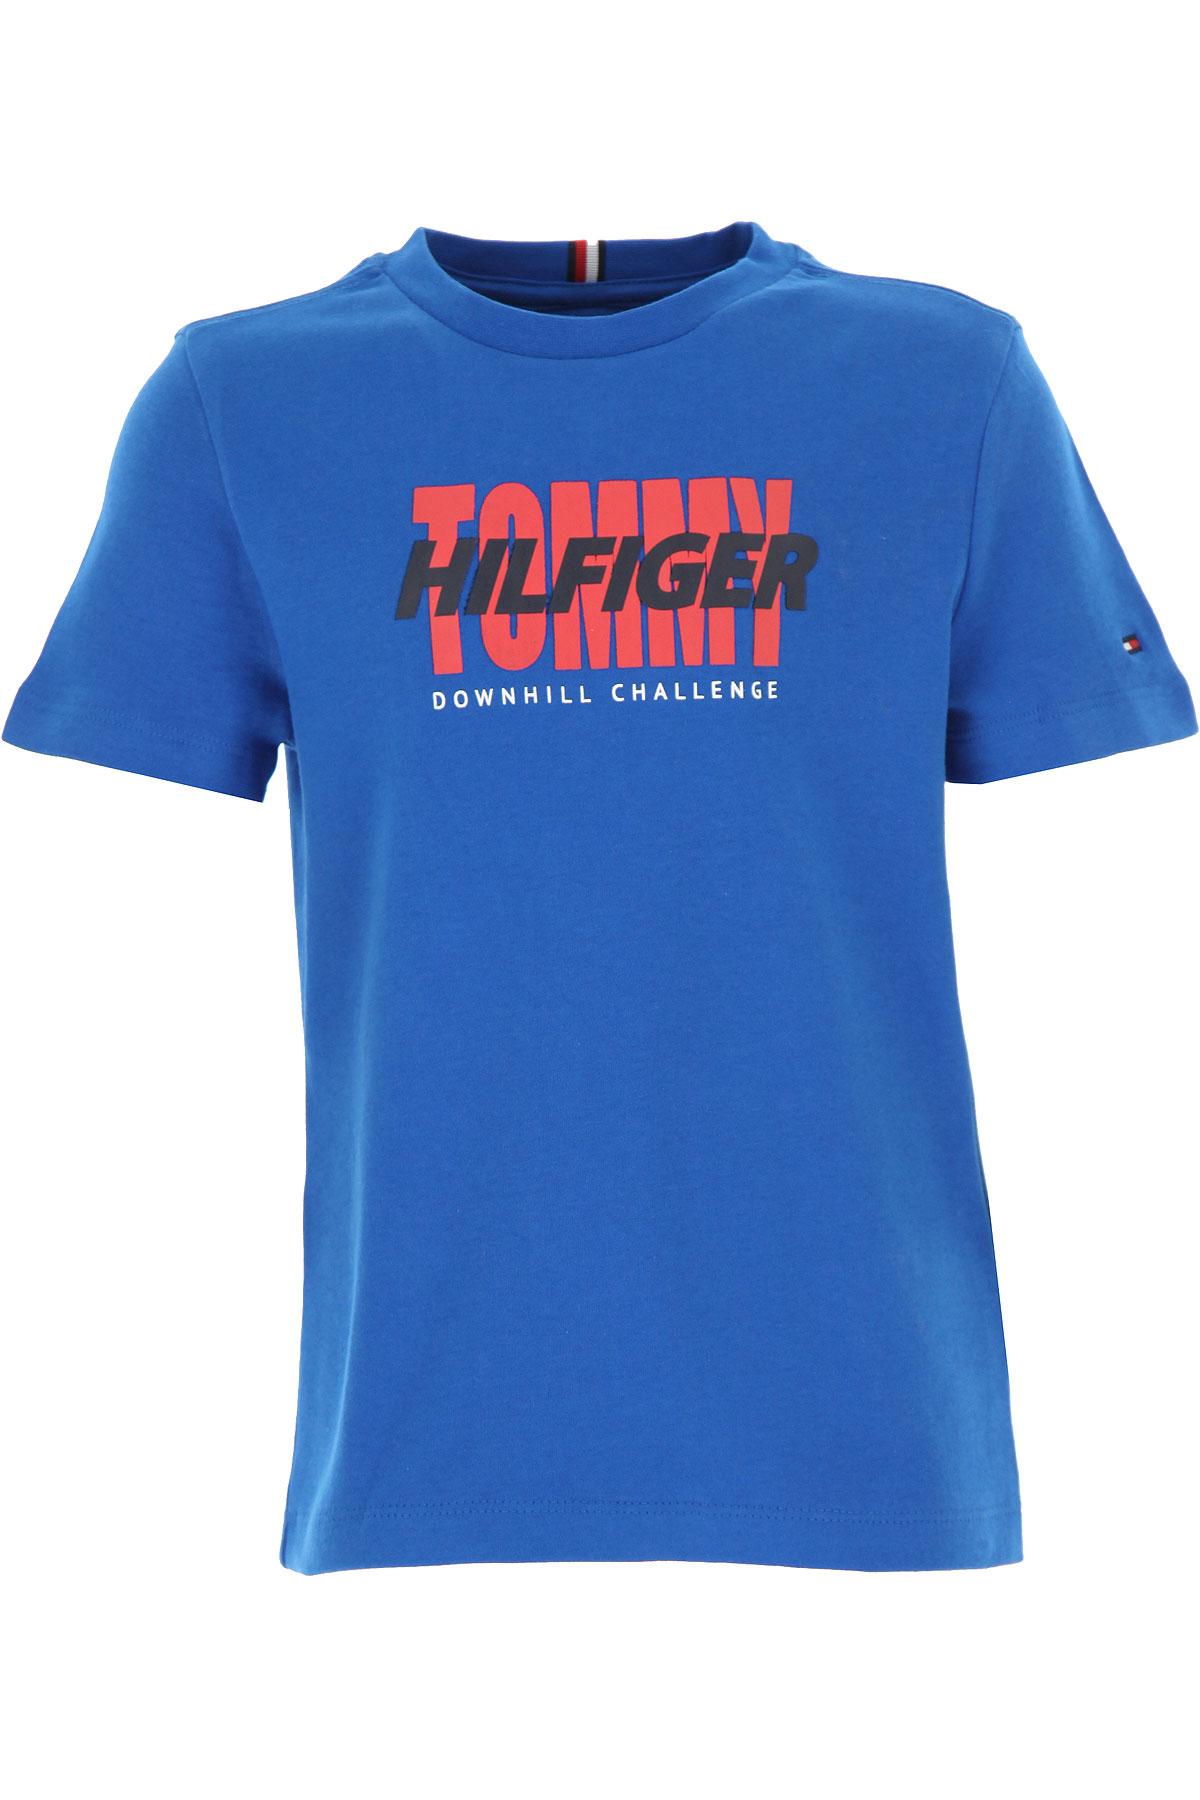 Tommy Hilfiger Kids T-Shirt for Boys On Sale, Electric Blue, Cotton, 2019, 12Y 4Y 6Y